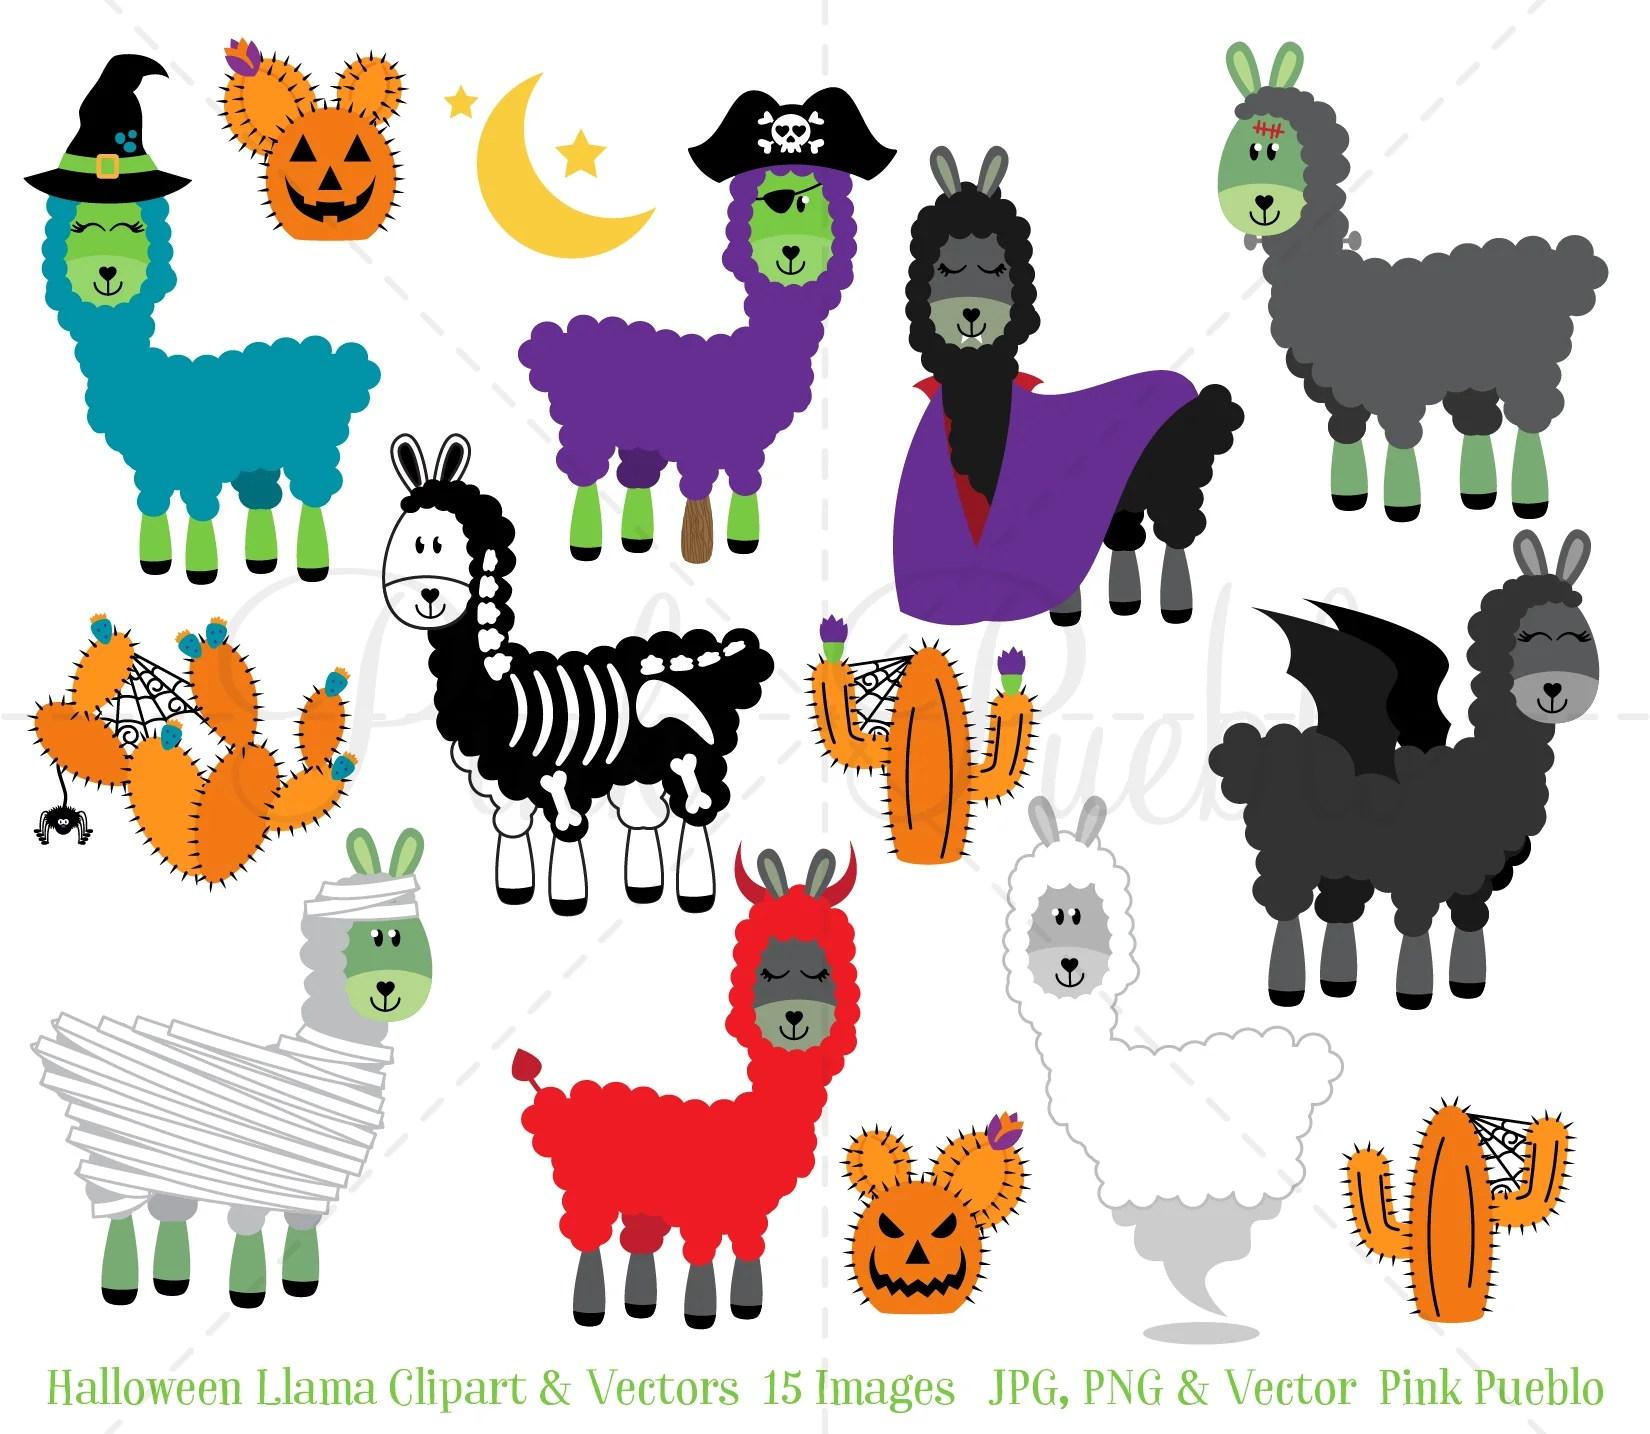 medium resolution of halloween llama clipart and vectors